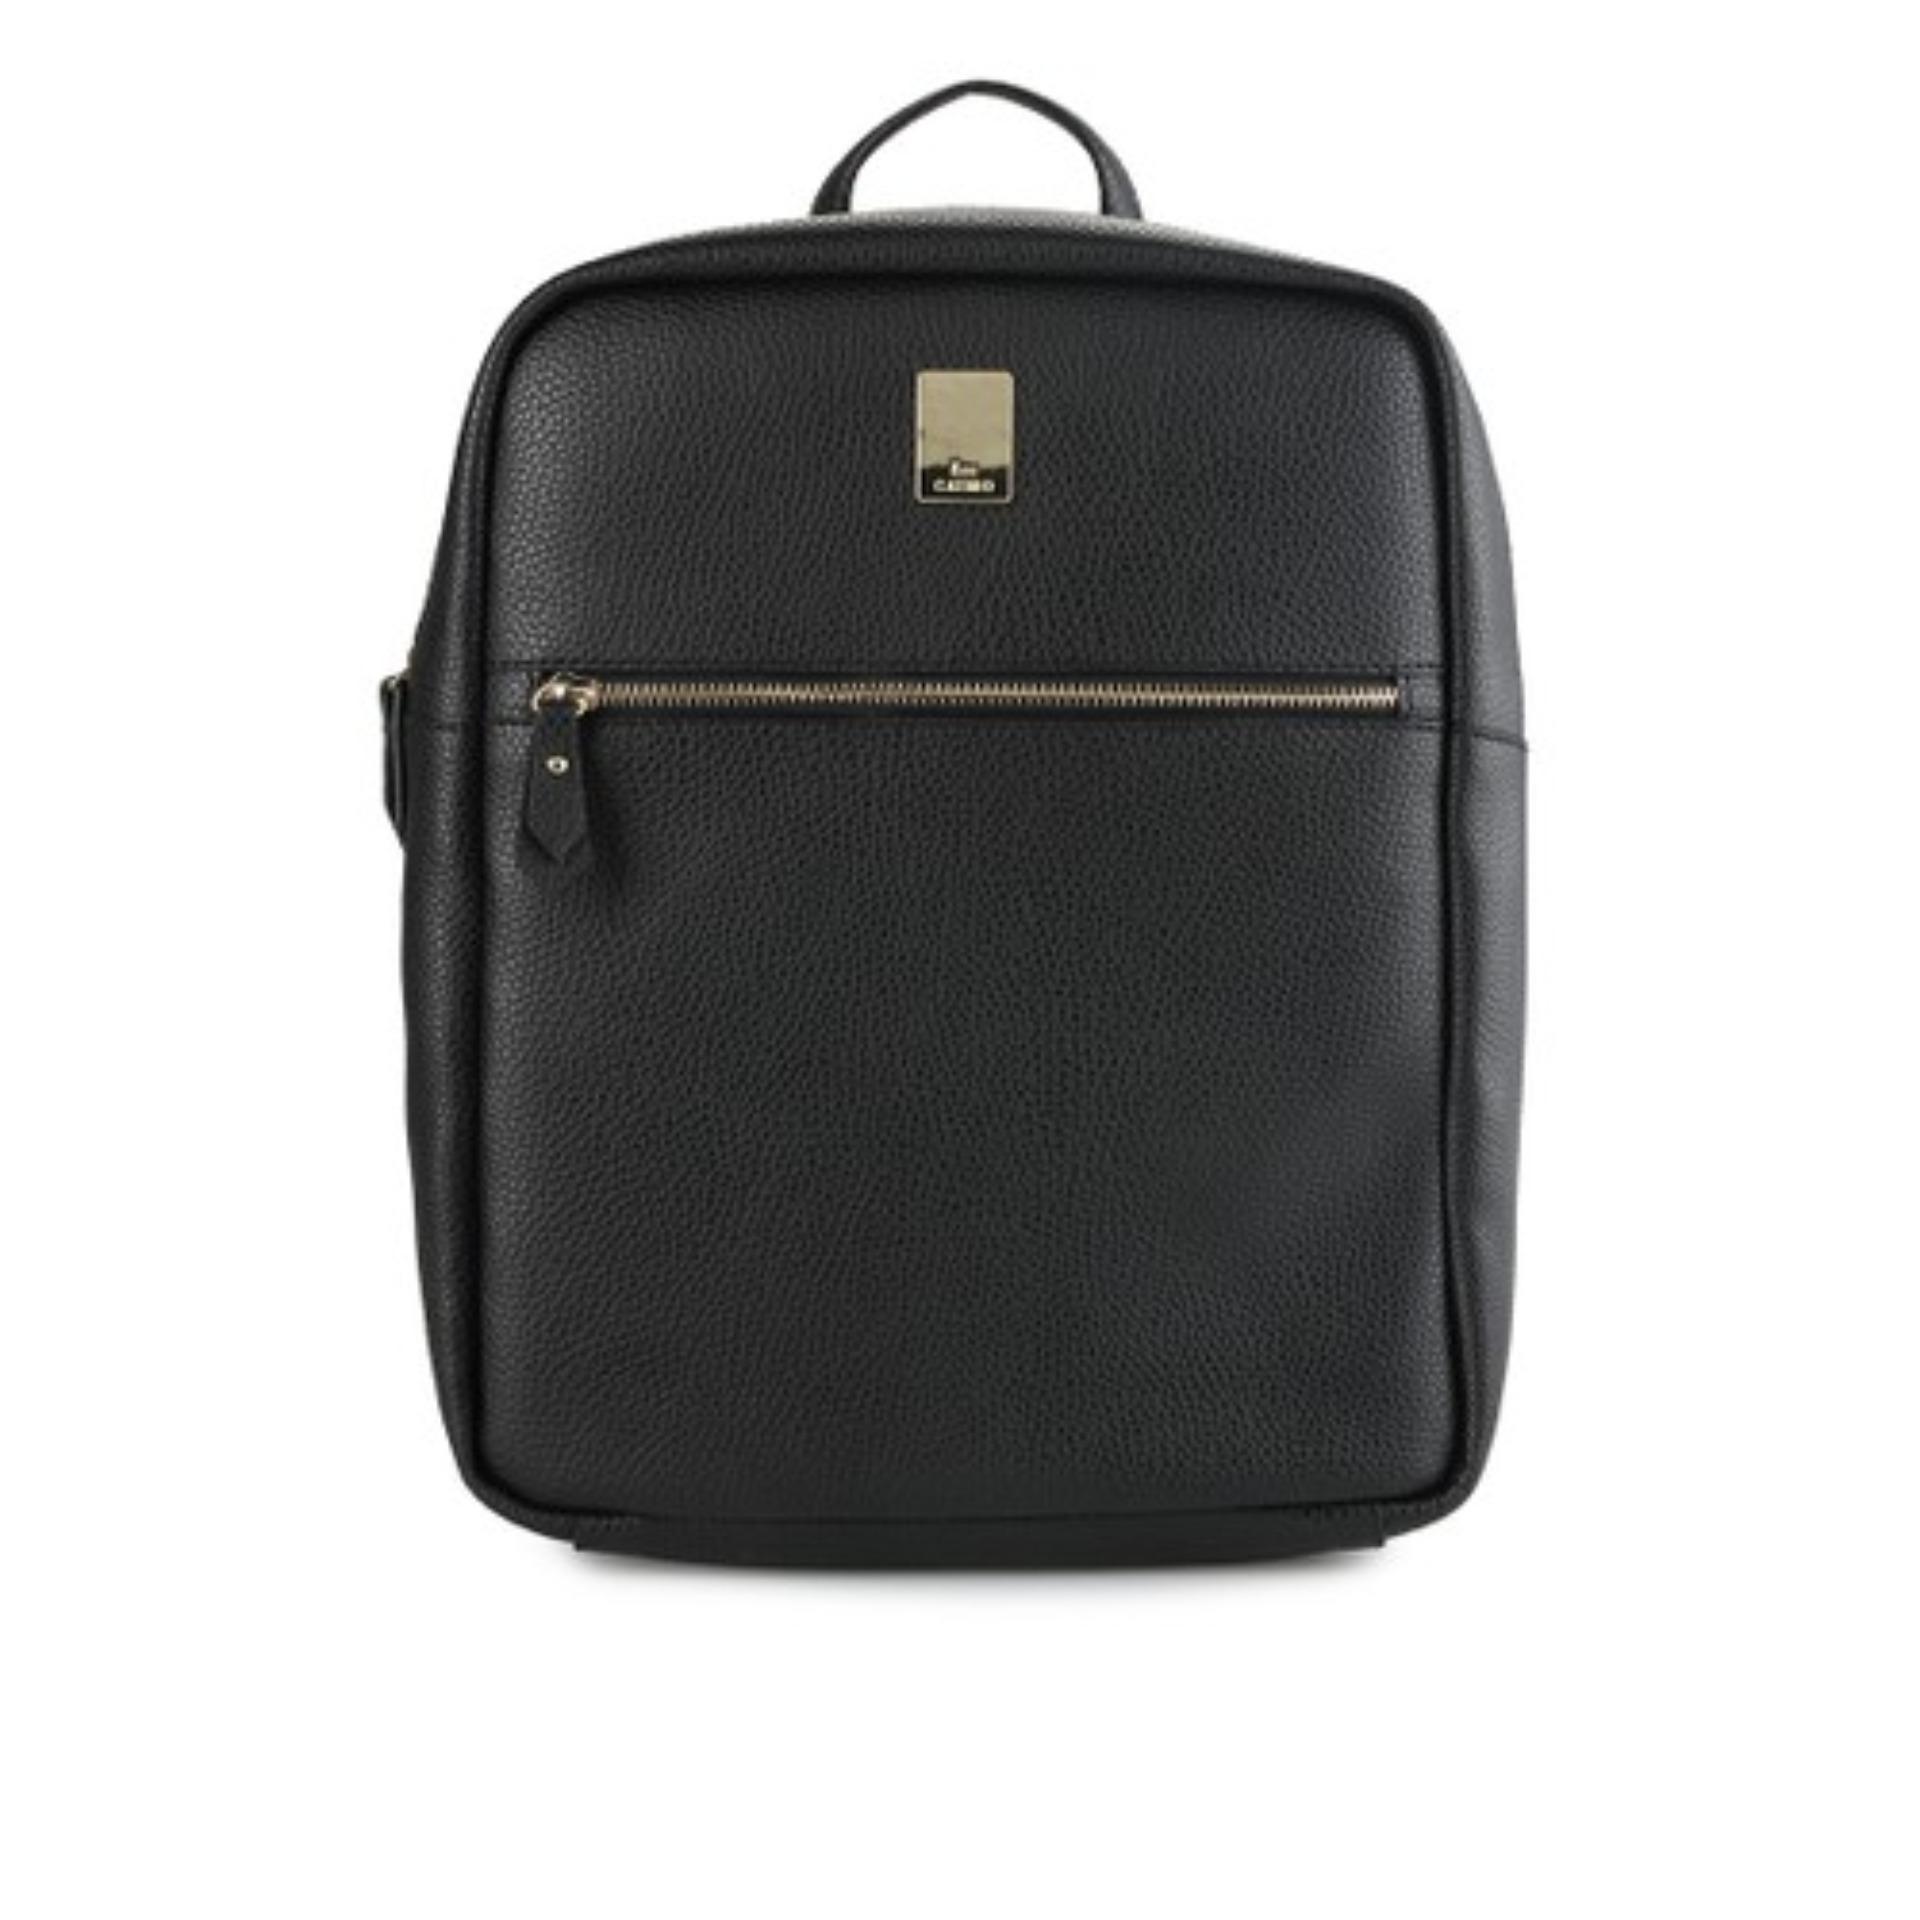 Beli Les Catino Tokyo Shibuya Backpack Solid Haze Harga Rp 839880 Harajuku Navy Agia Black Bag